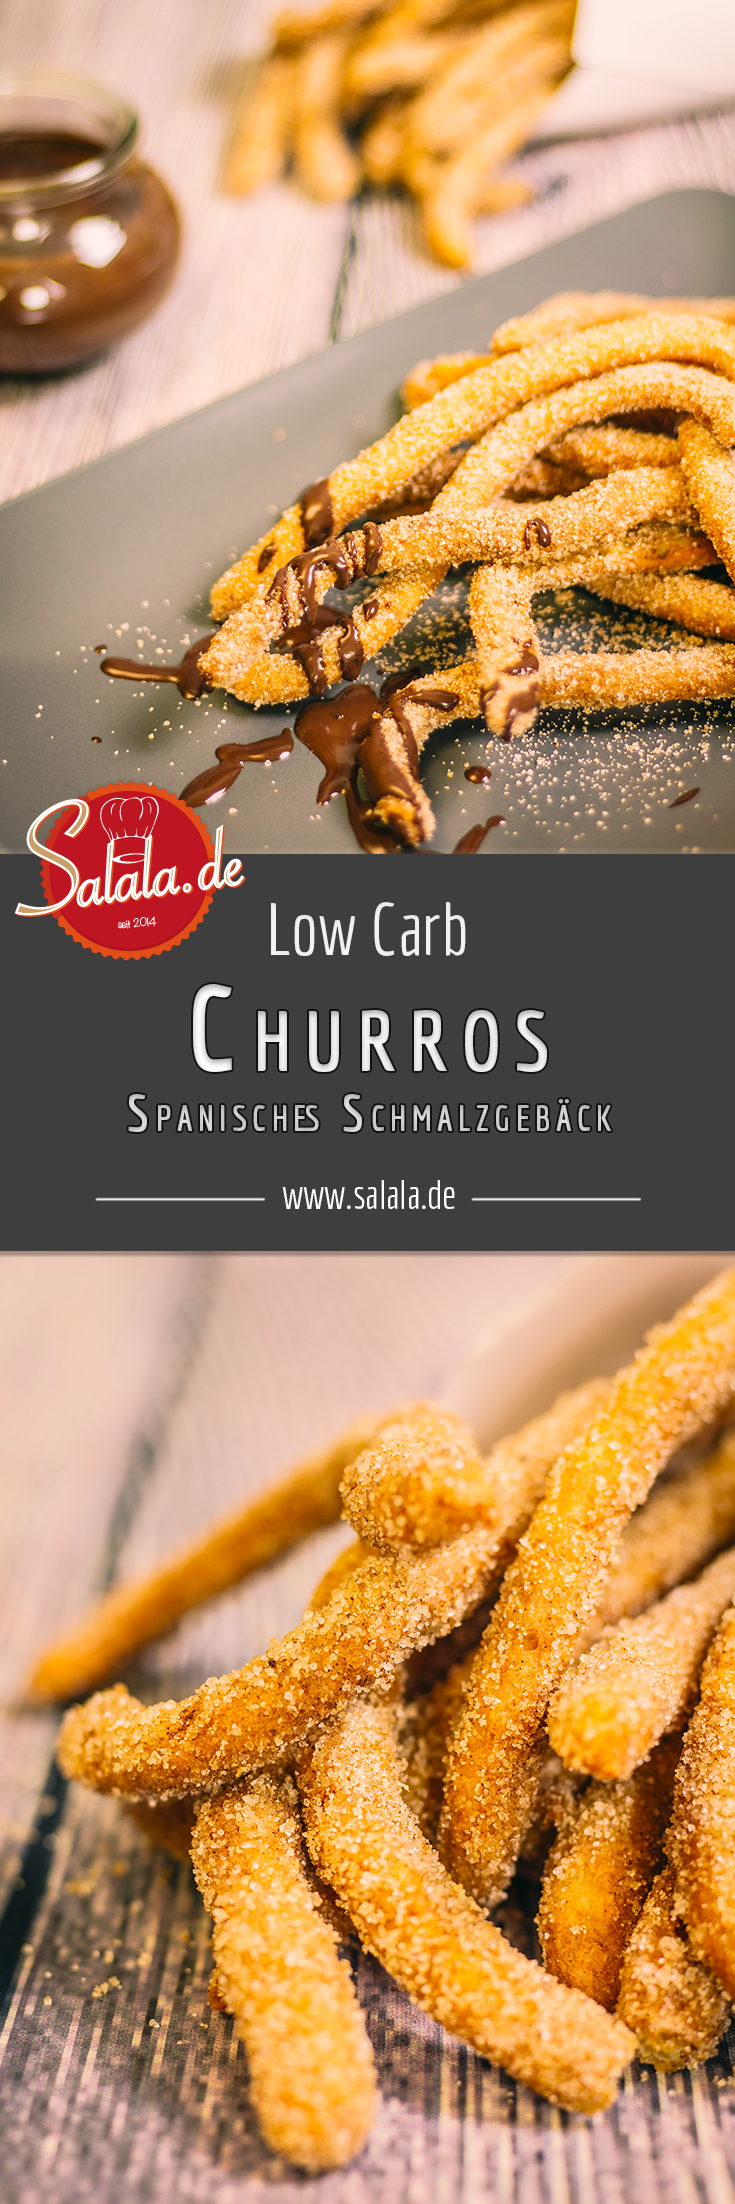 low carb churros rezept die besten low carb rezepte gruppenboard low carb churros und. Black Bedroom Furniture Sets. Home Design Ideas